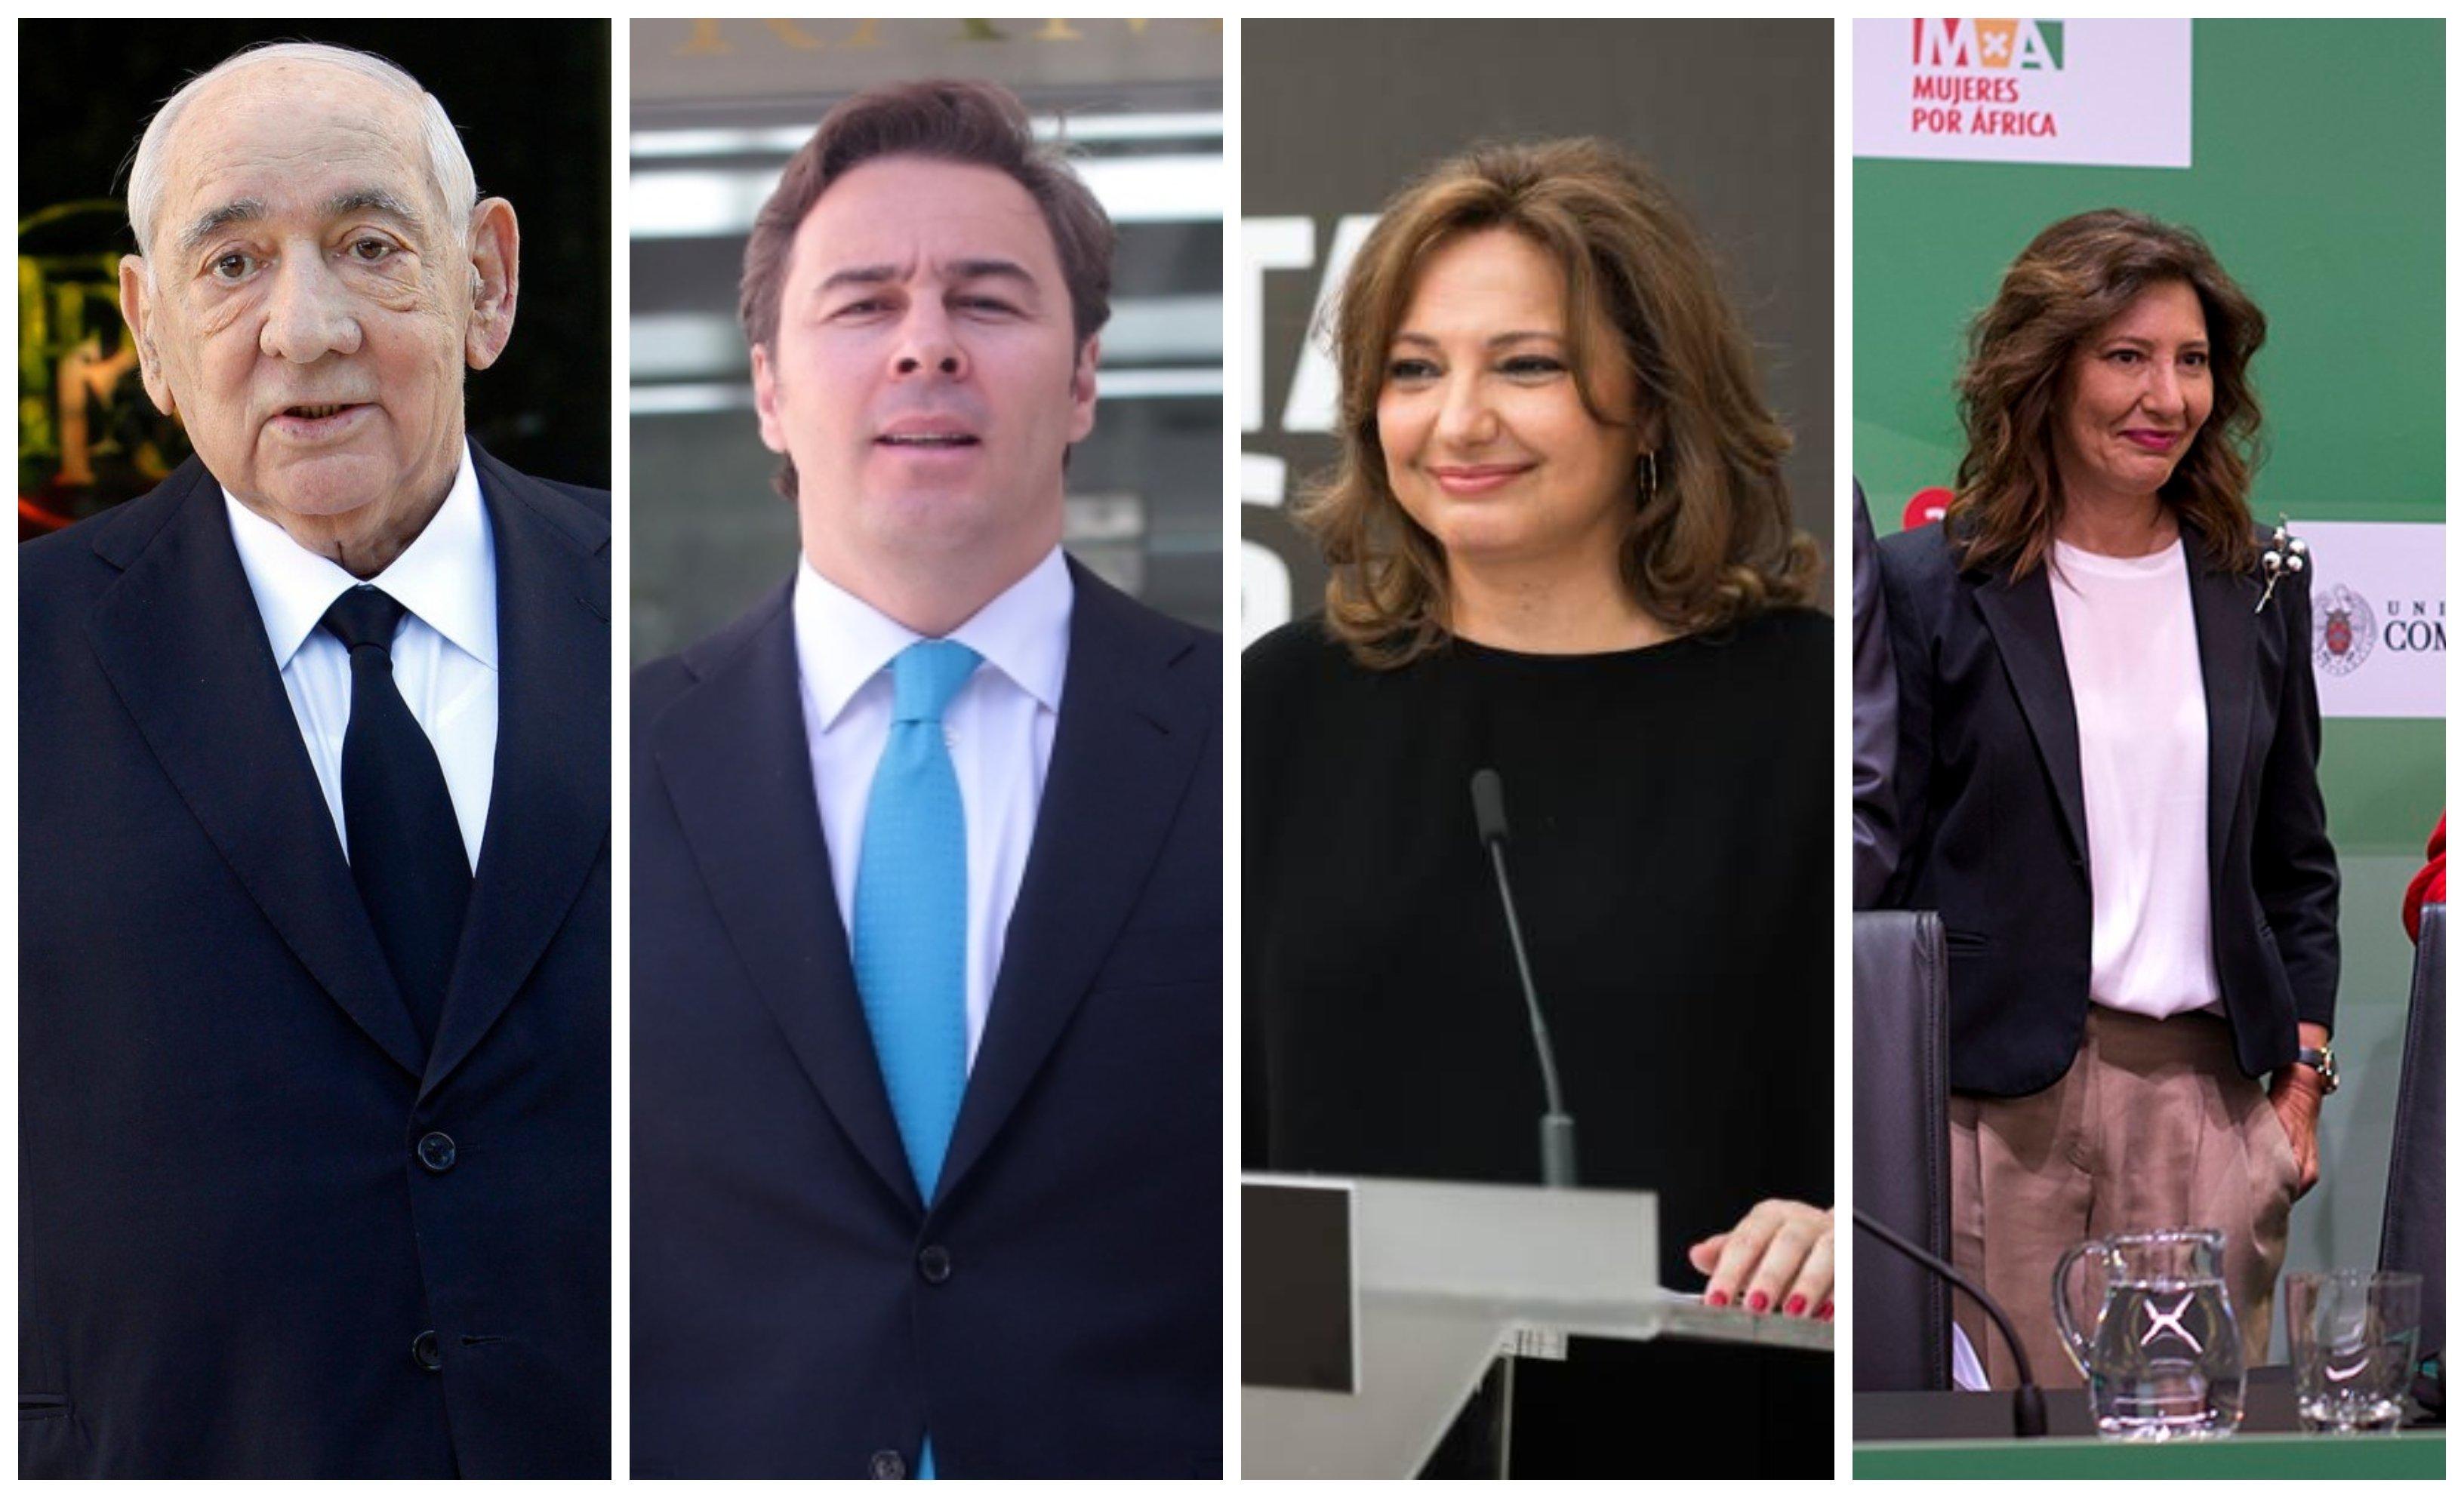 Isidoro Álvarez, Dimas Gimeno, Marta Álvarez y Cristina Álvarez